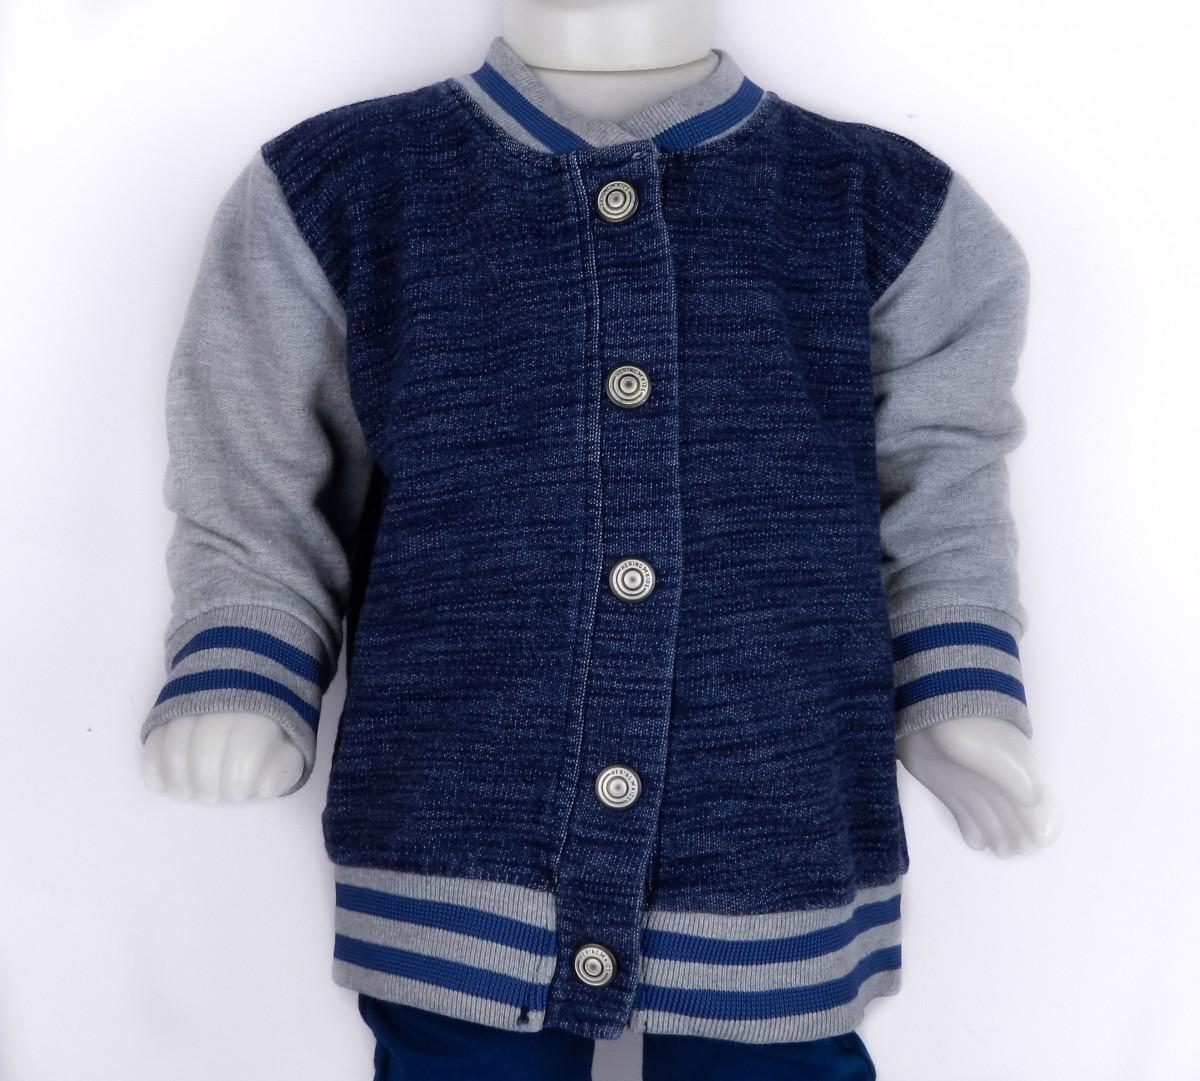 e13f38e71 Bizz Store - Jaqueta Jeans Moletom Infantil Hering Kids College